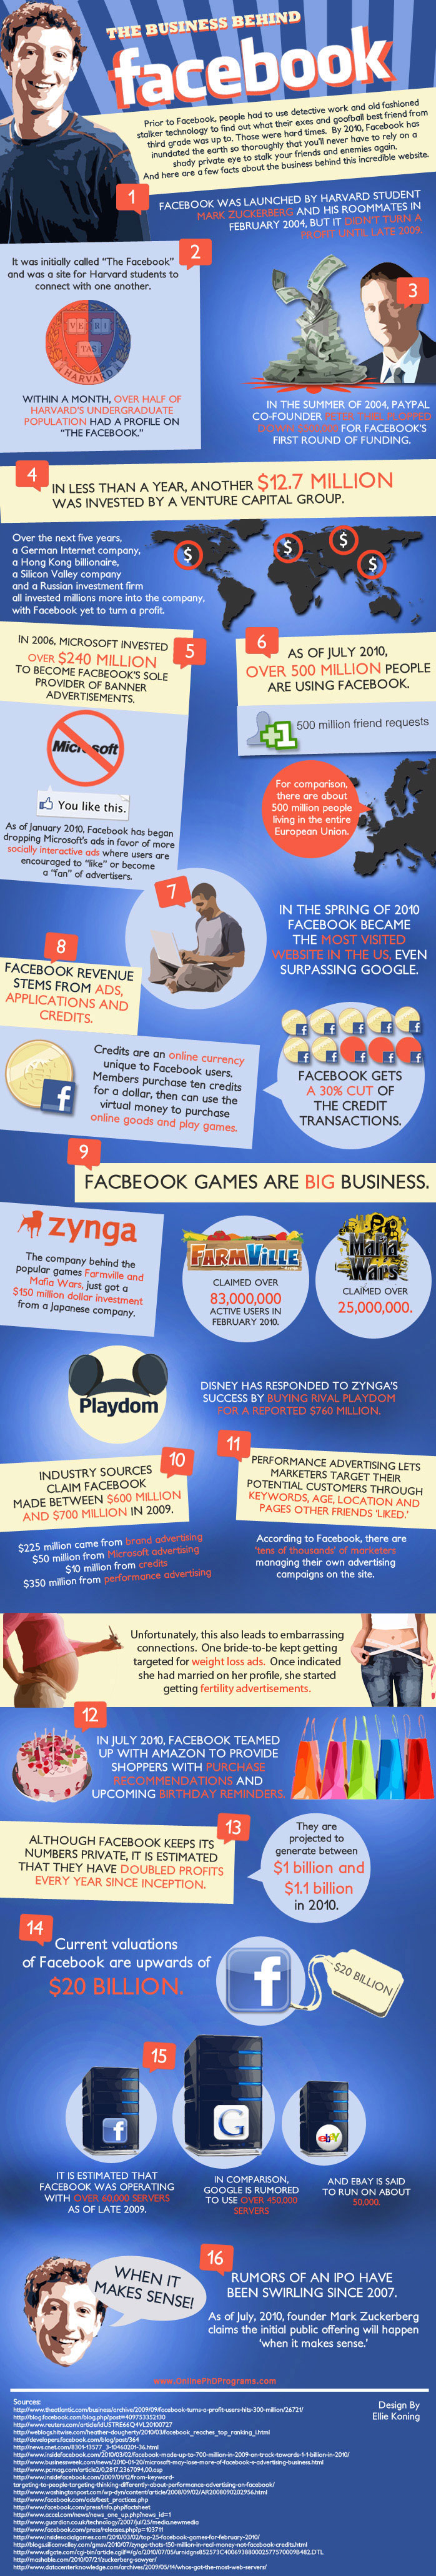 business-behind-facebook